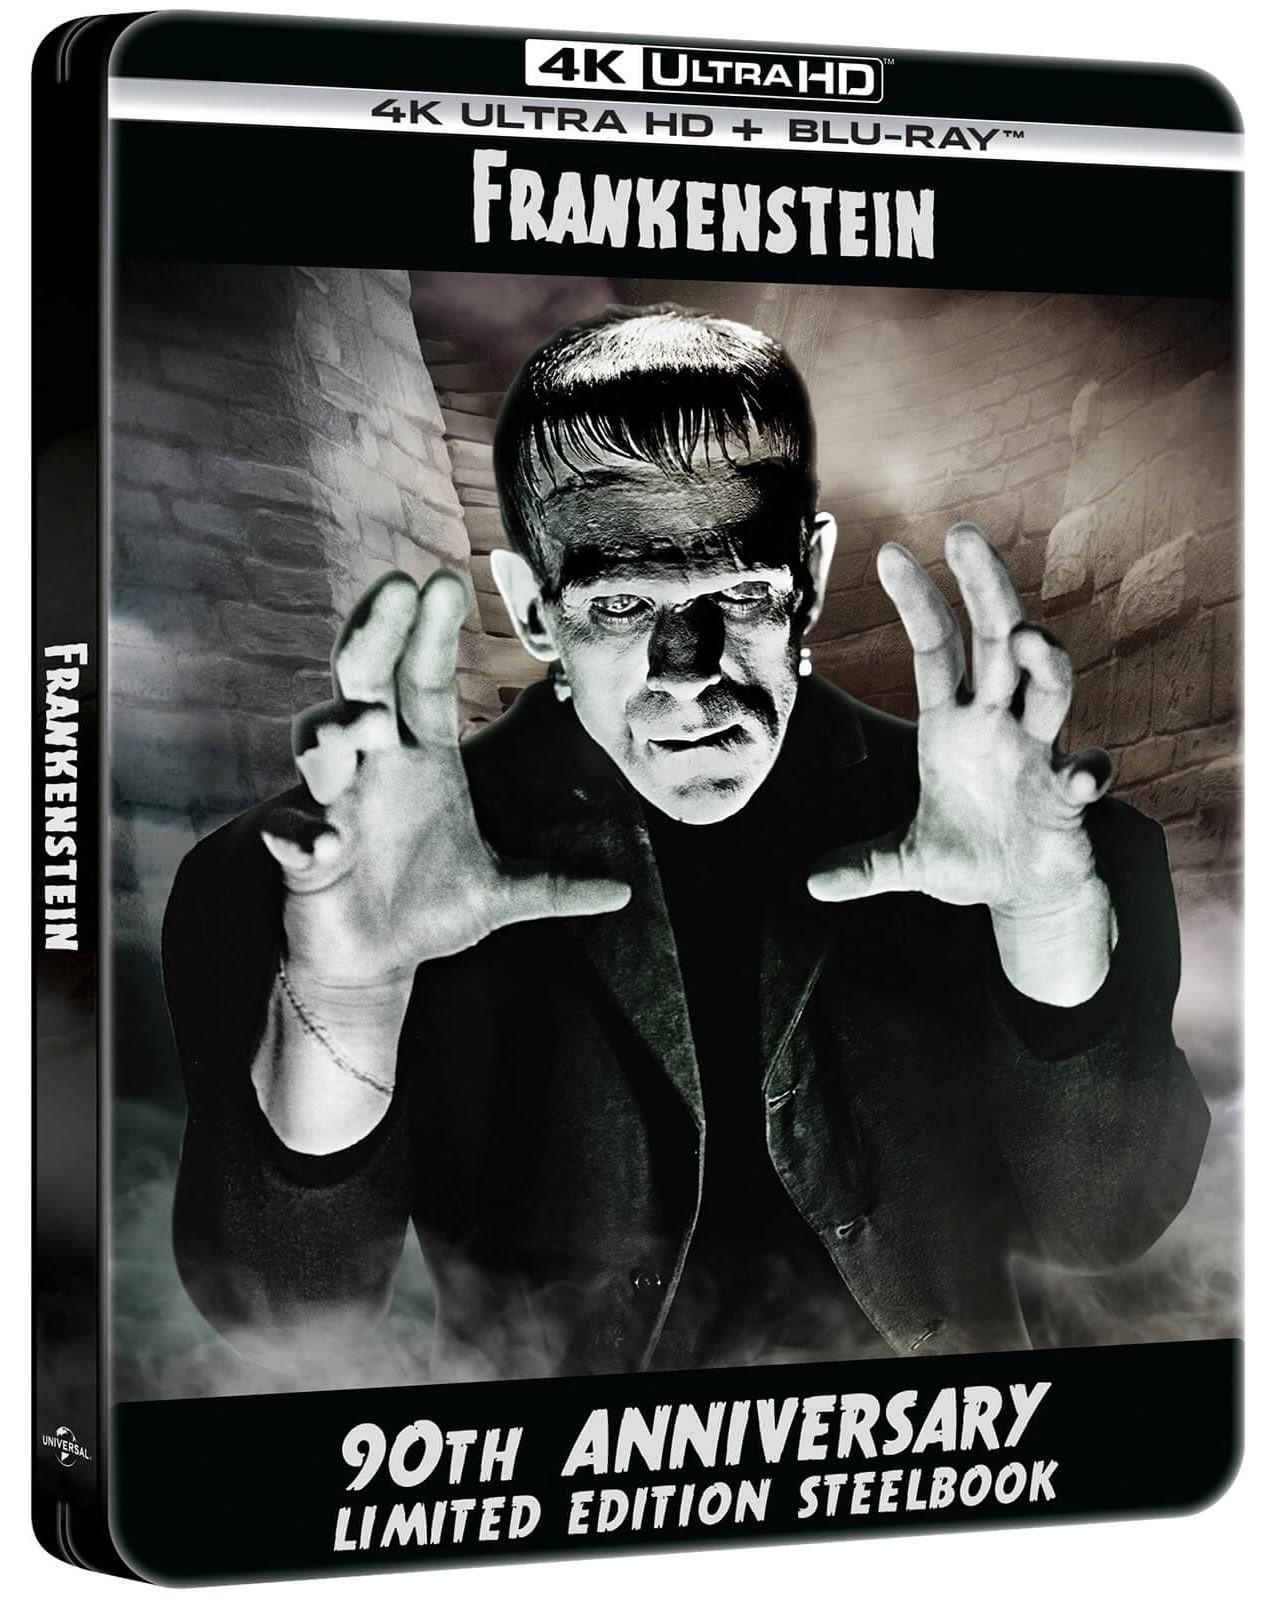 Frankenstein steelbook 4K UHD